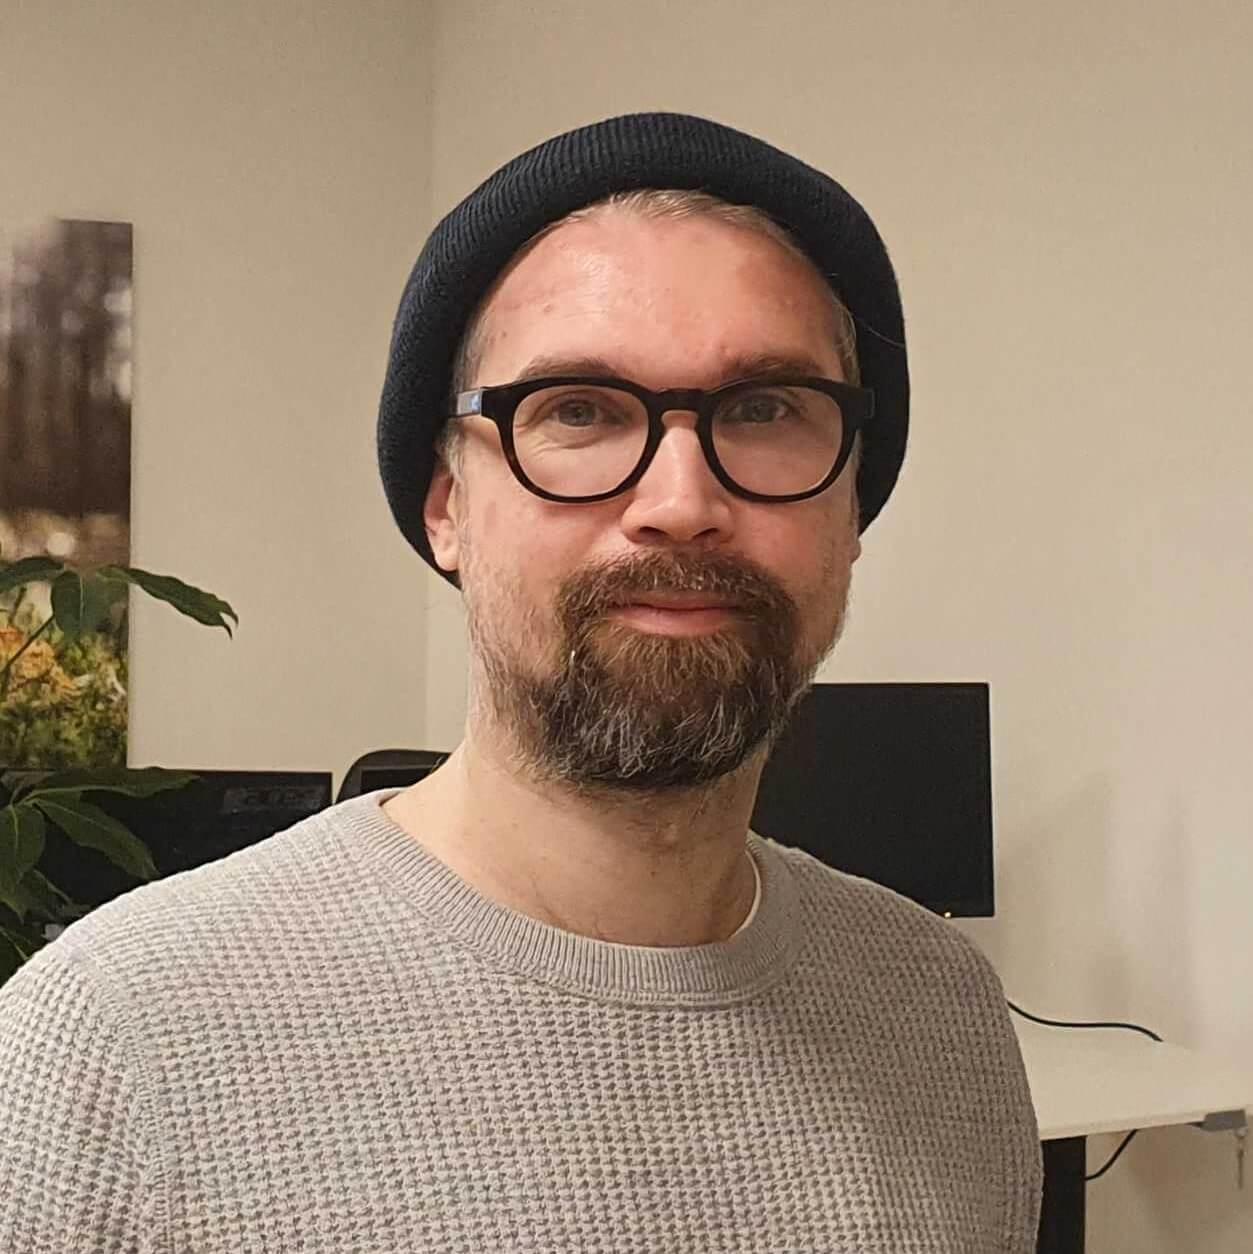 Brian Kaibinger, Customer Success Manager at Morningscore